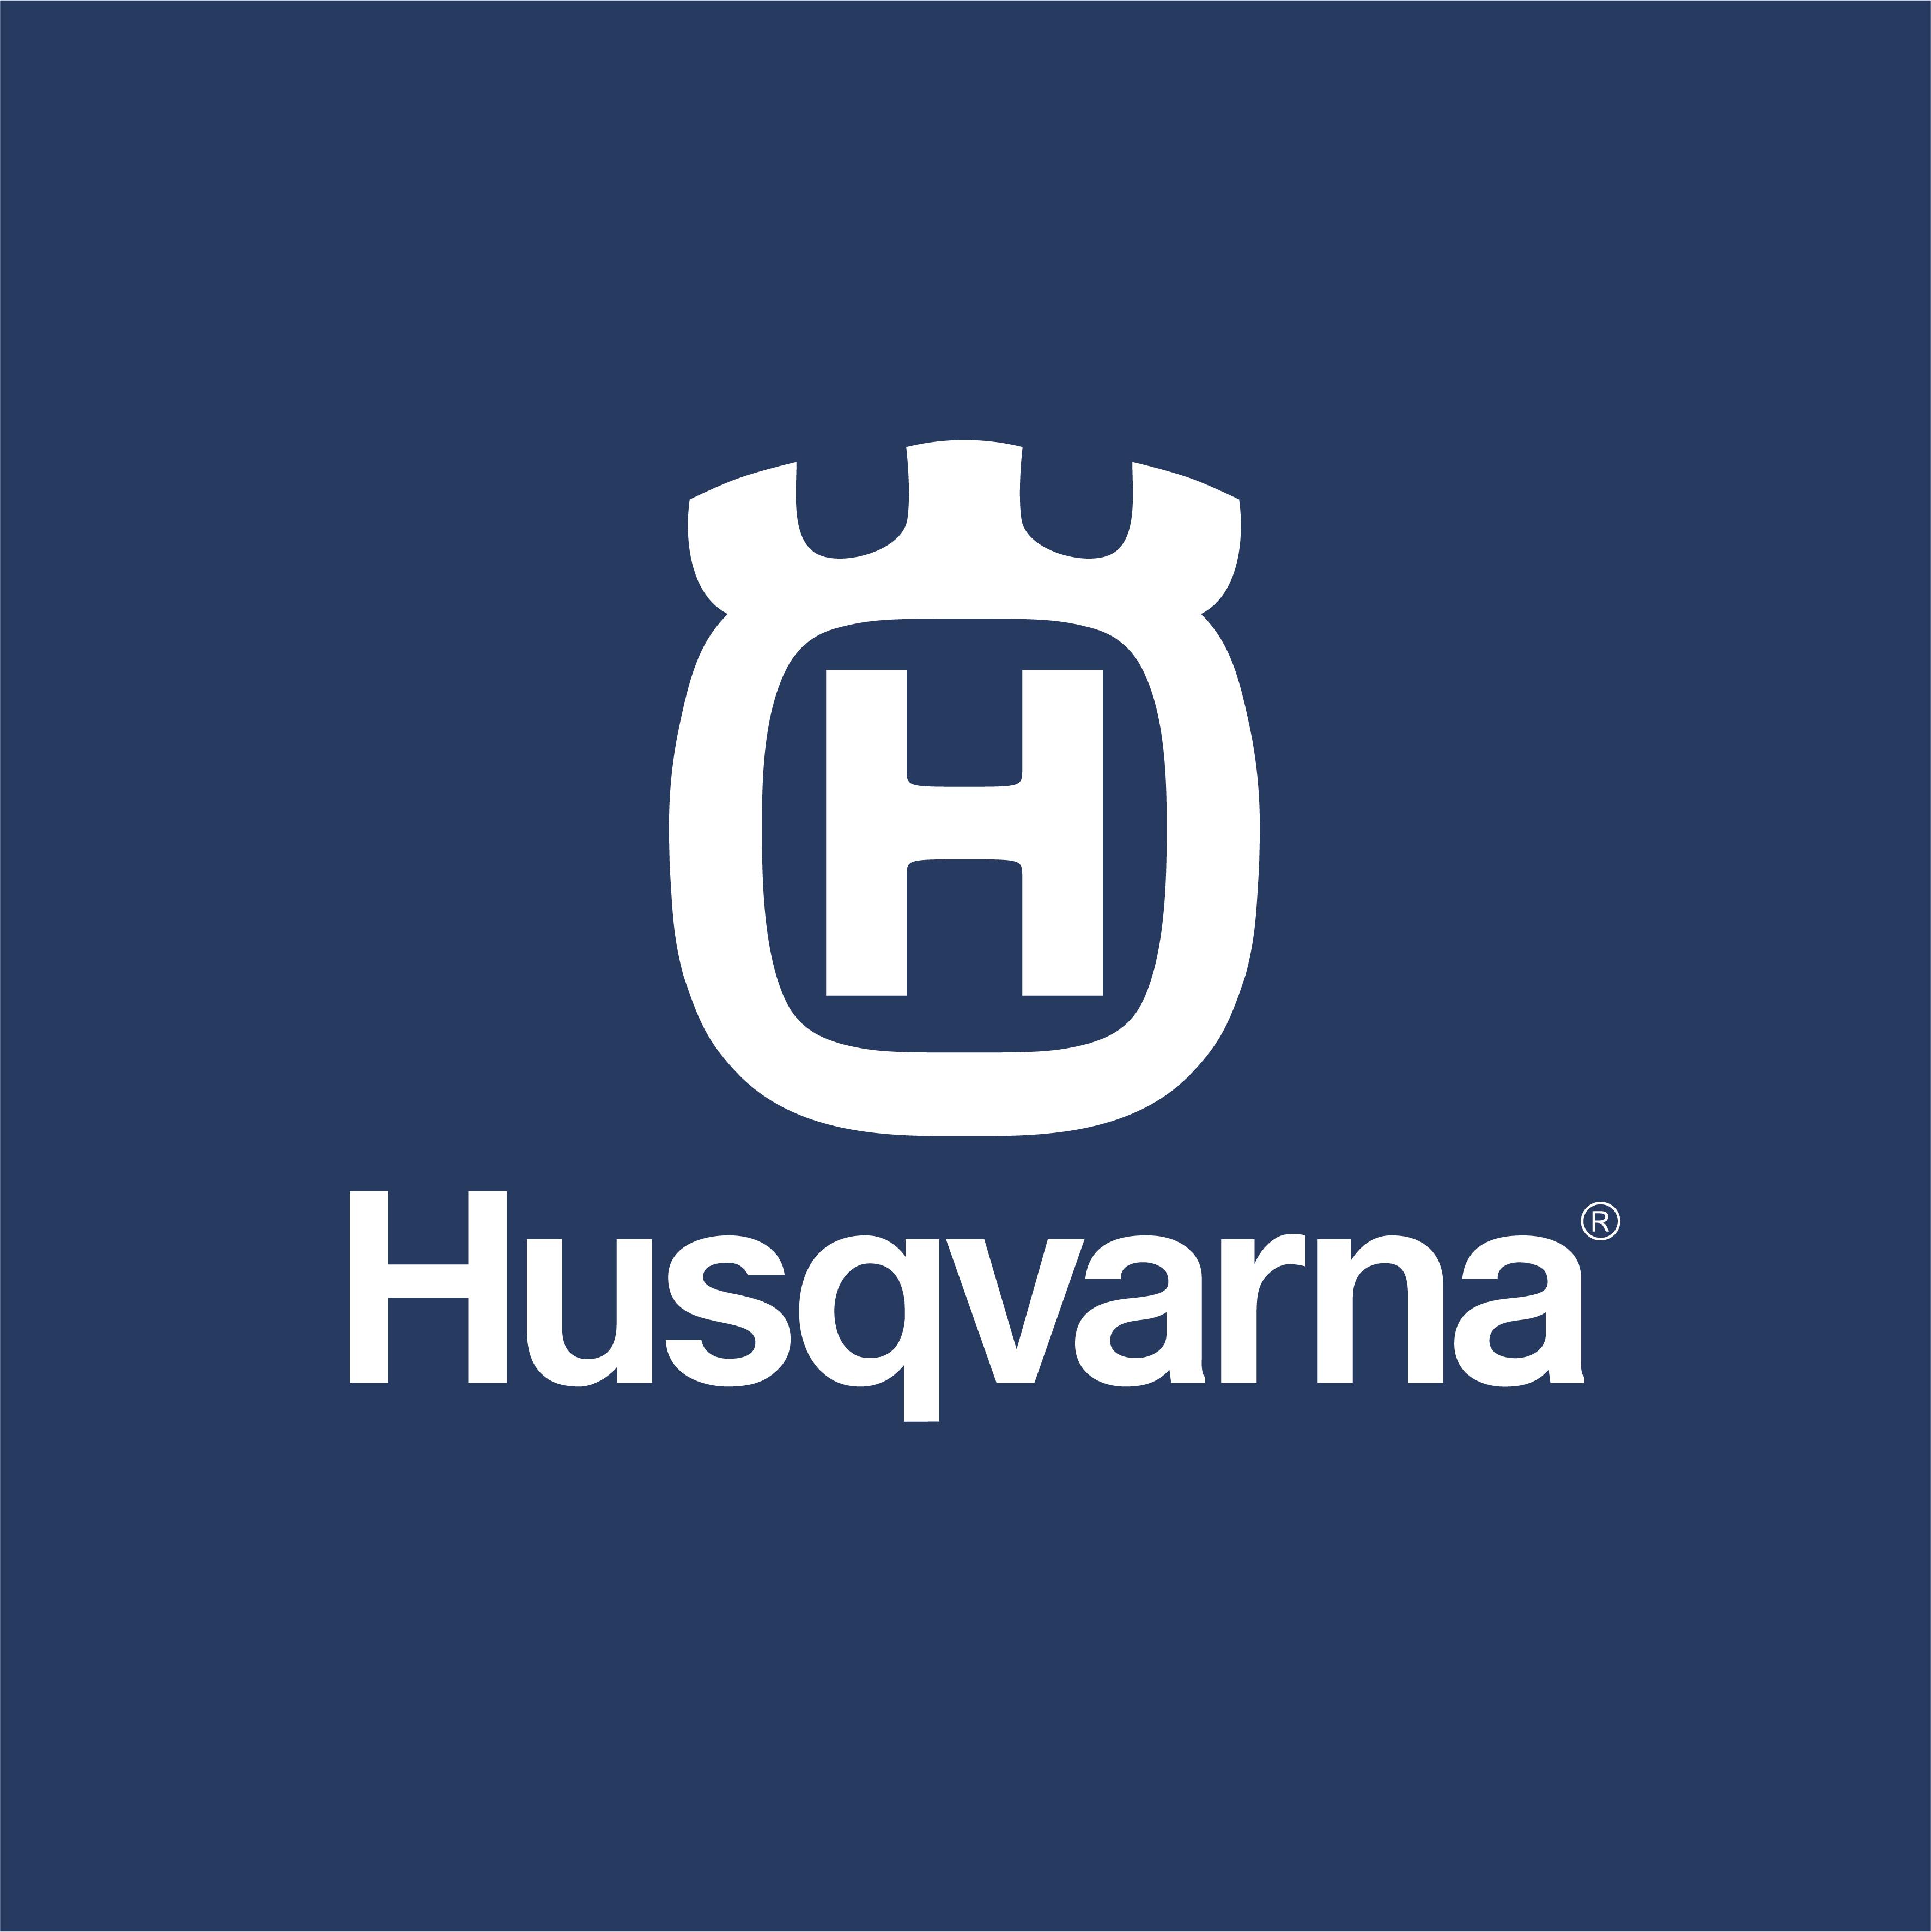 H880-0400 - Logo Husqvarna RGB